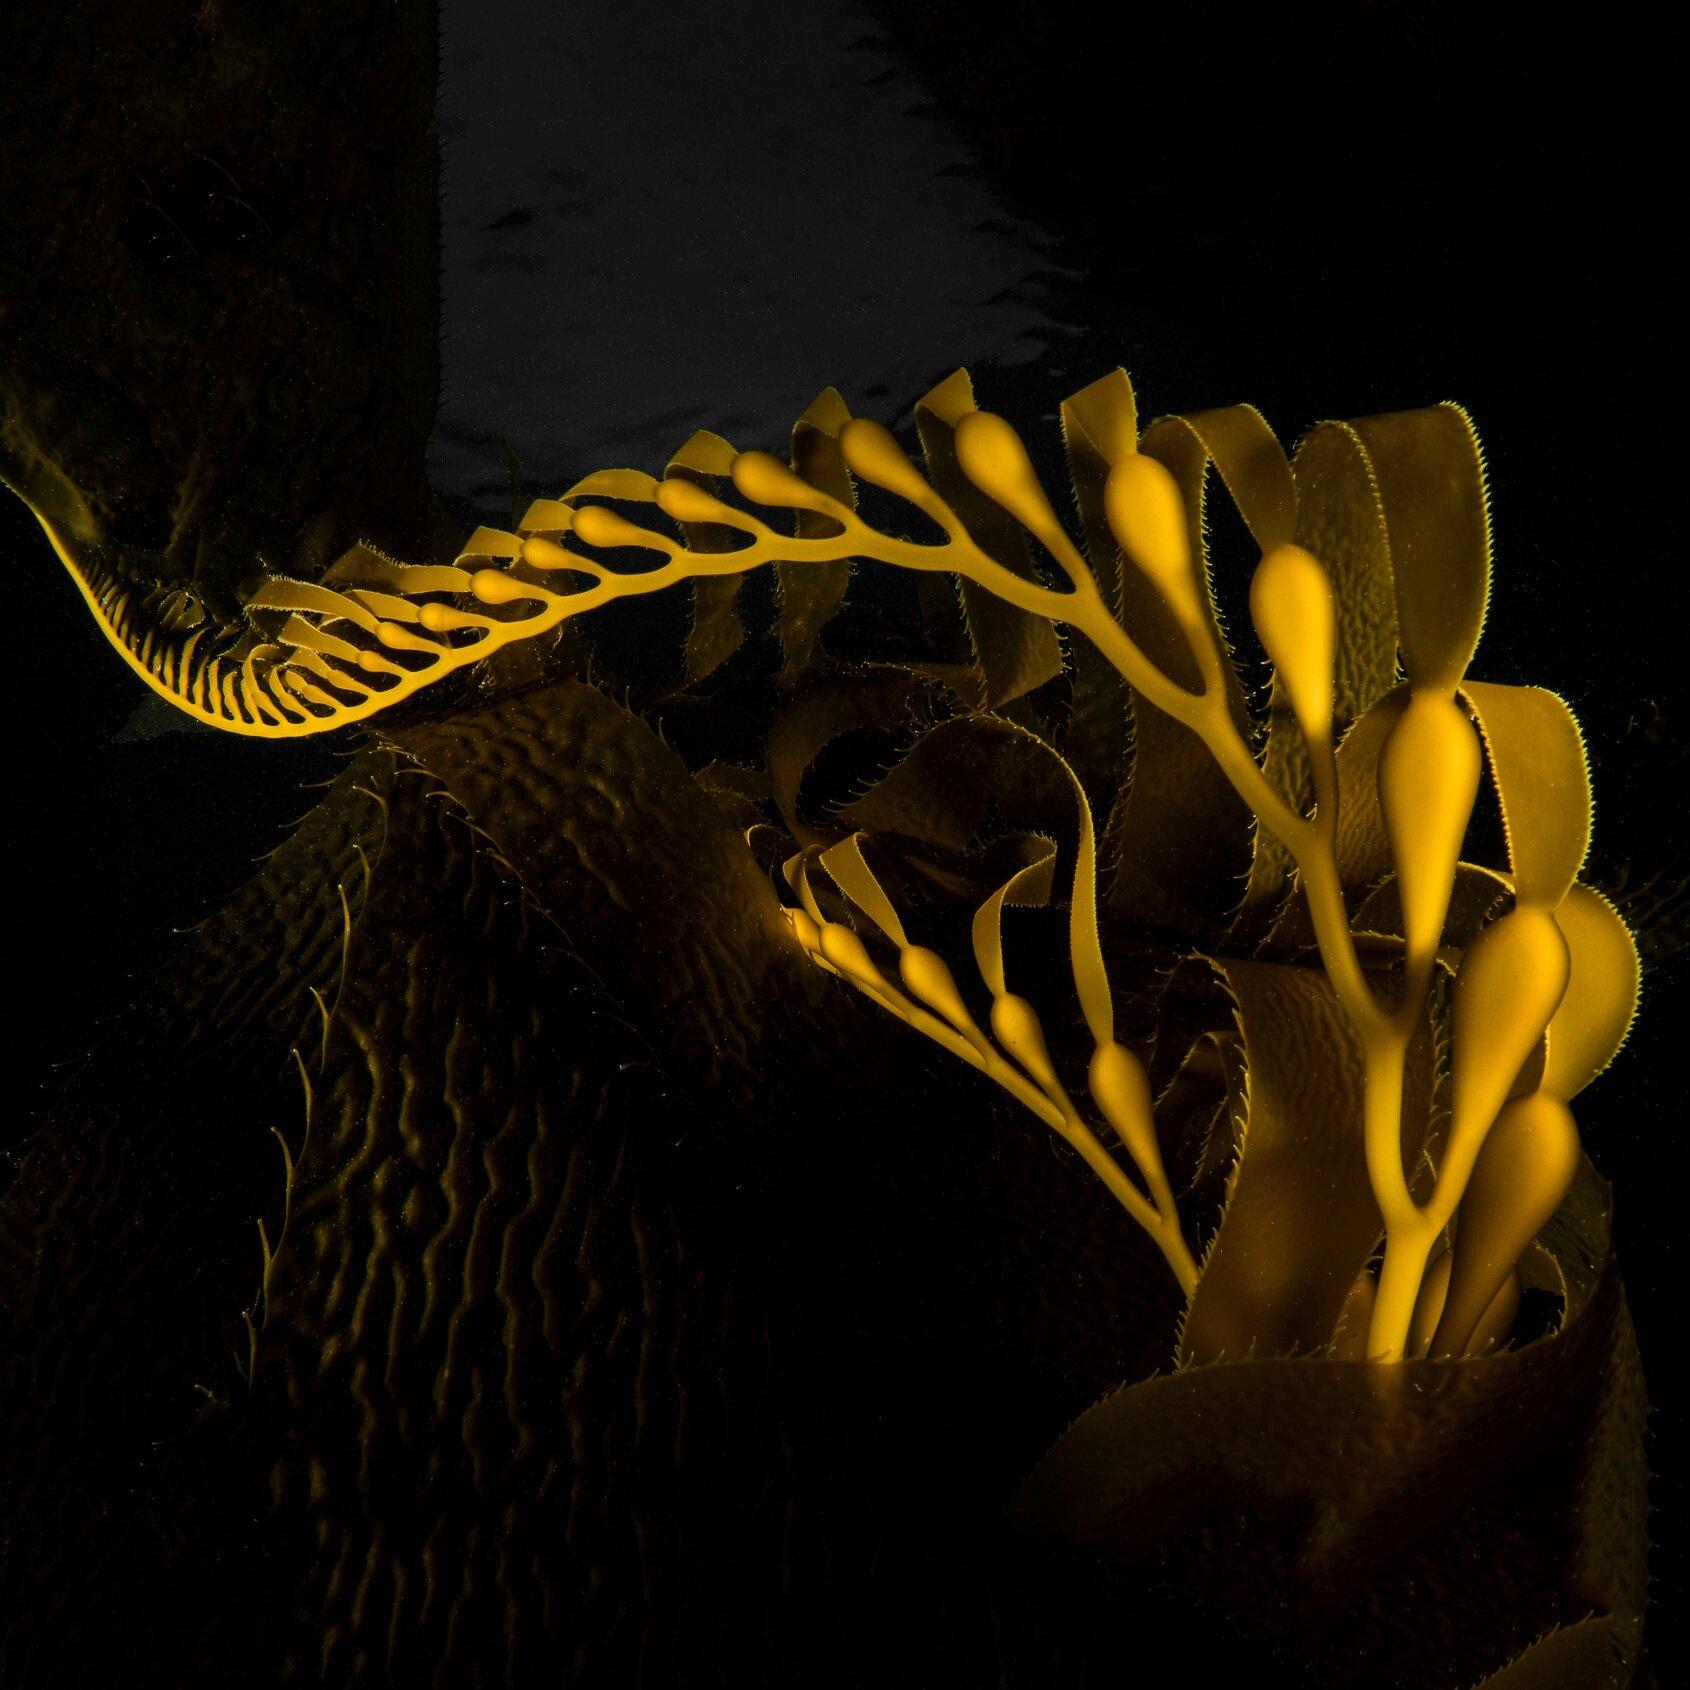 Ama_Sea_Beauty_Seaweed_amaseabeauty_sea_plants_sb_primordial.jpg